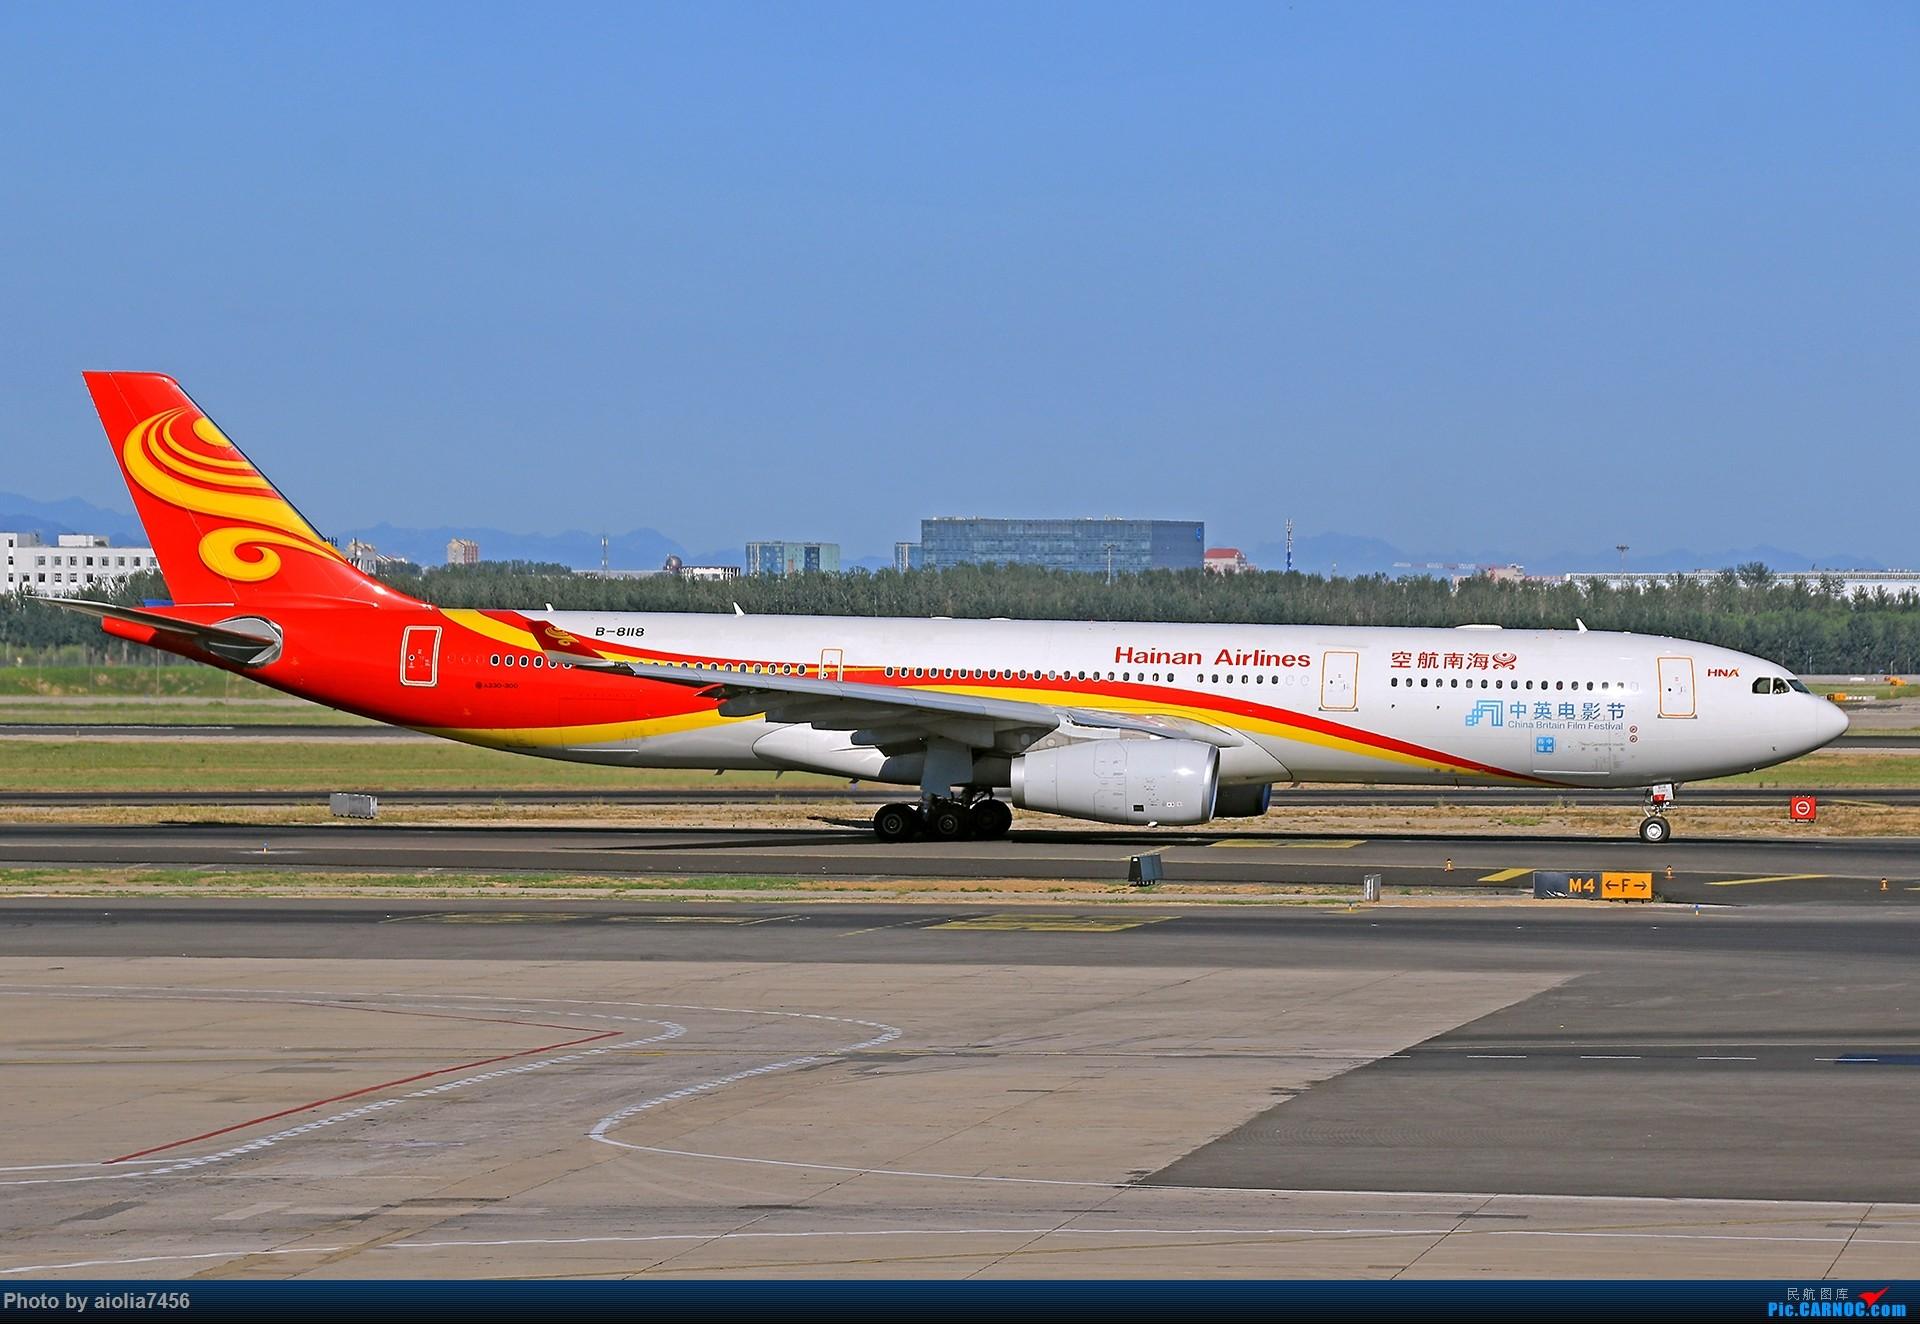 Re:[原创]合肥飞友会[霸都飞友会]冷风过境,吹回了久违的蓝天,而我刚刚好路过PEK AIRBUS A330-300 B-8118 中国北京首都国际机场